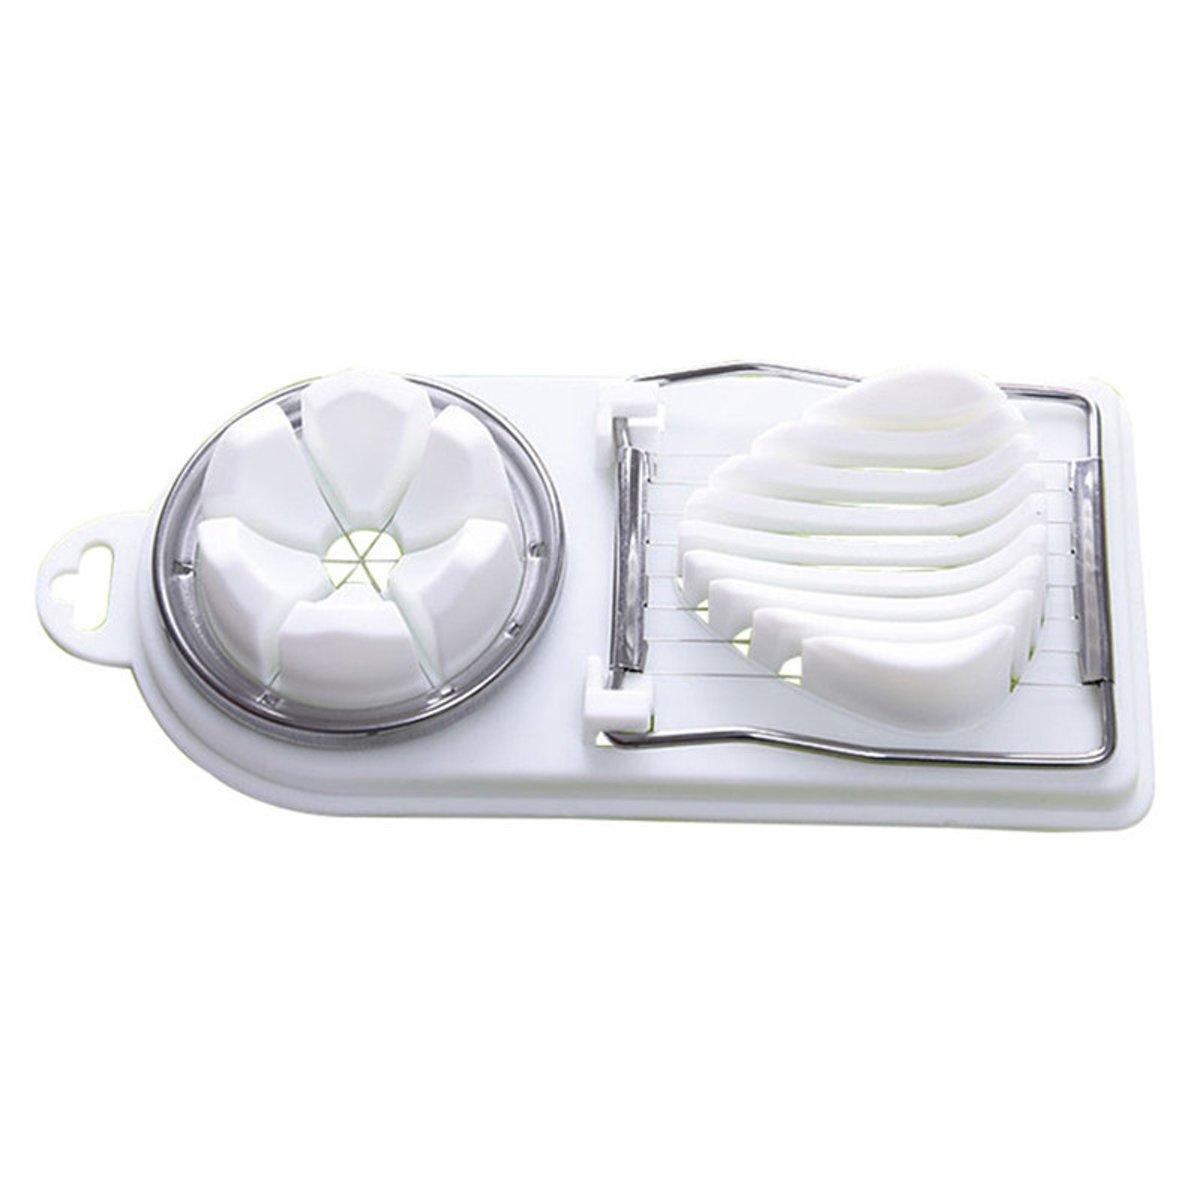 Handige Multifunctionele eiersnijder wit kopen